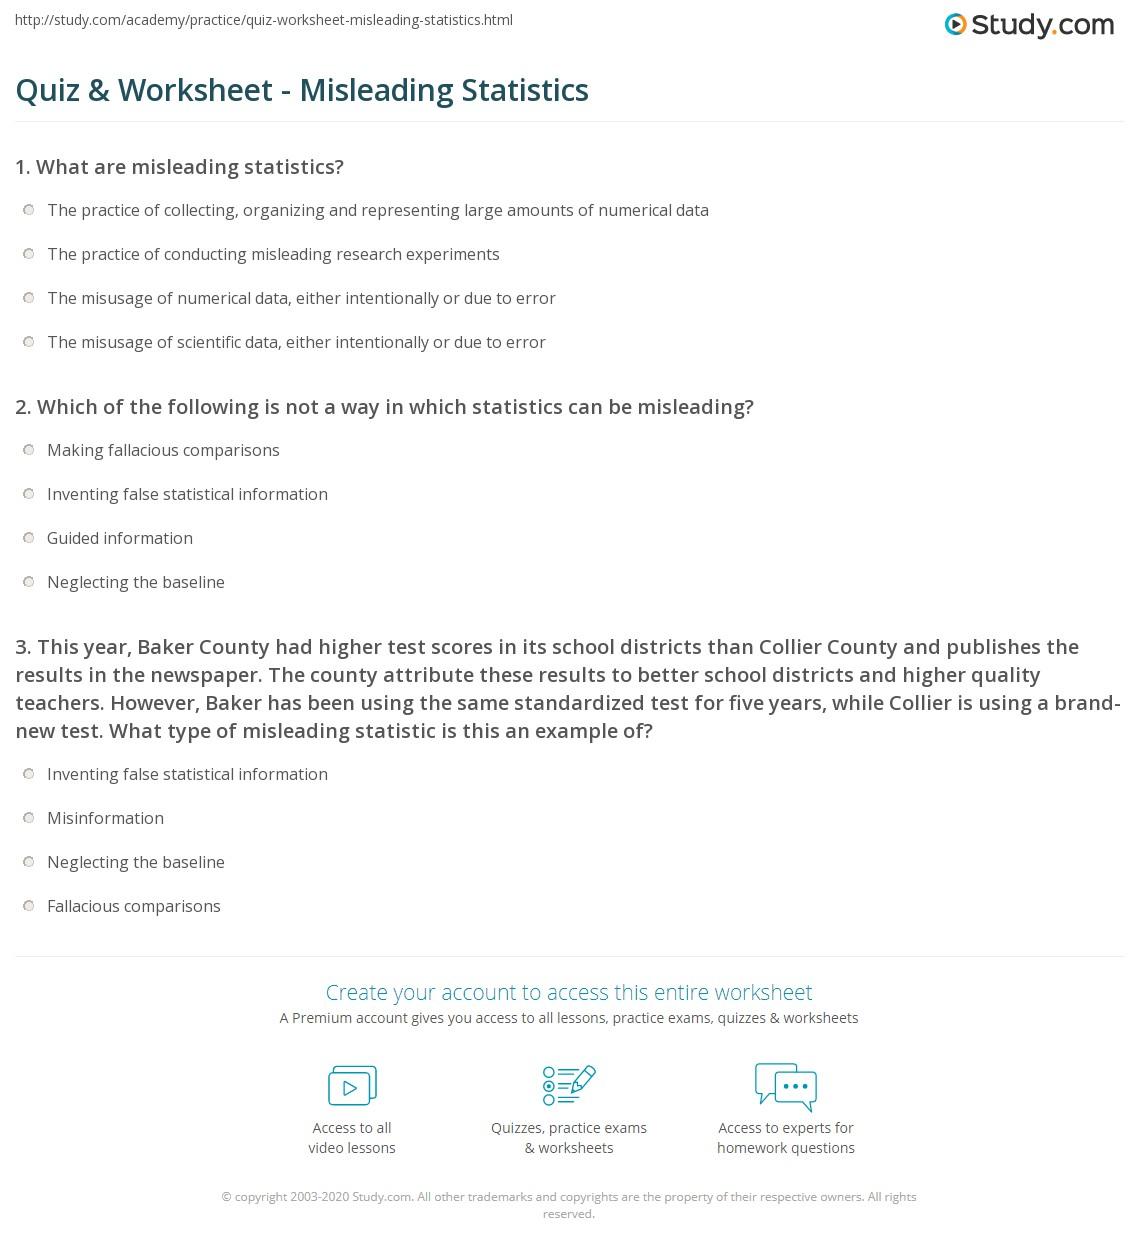 Quiz Worksheet Misleading Statistics Study